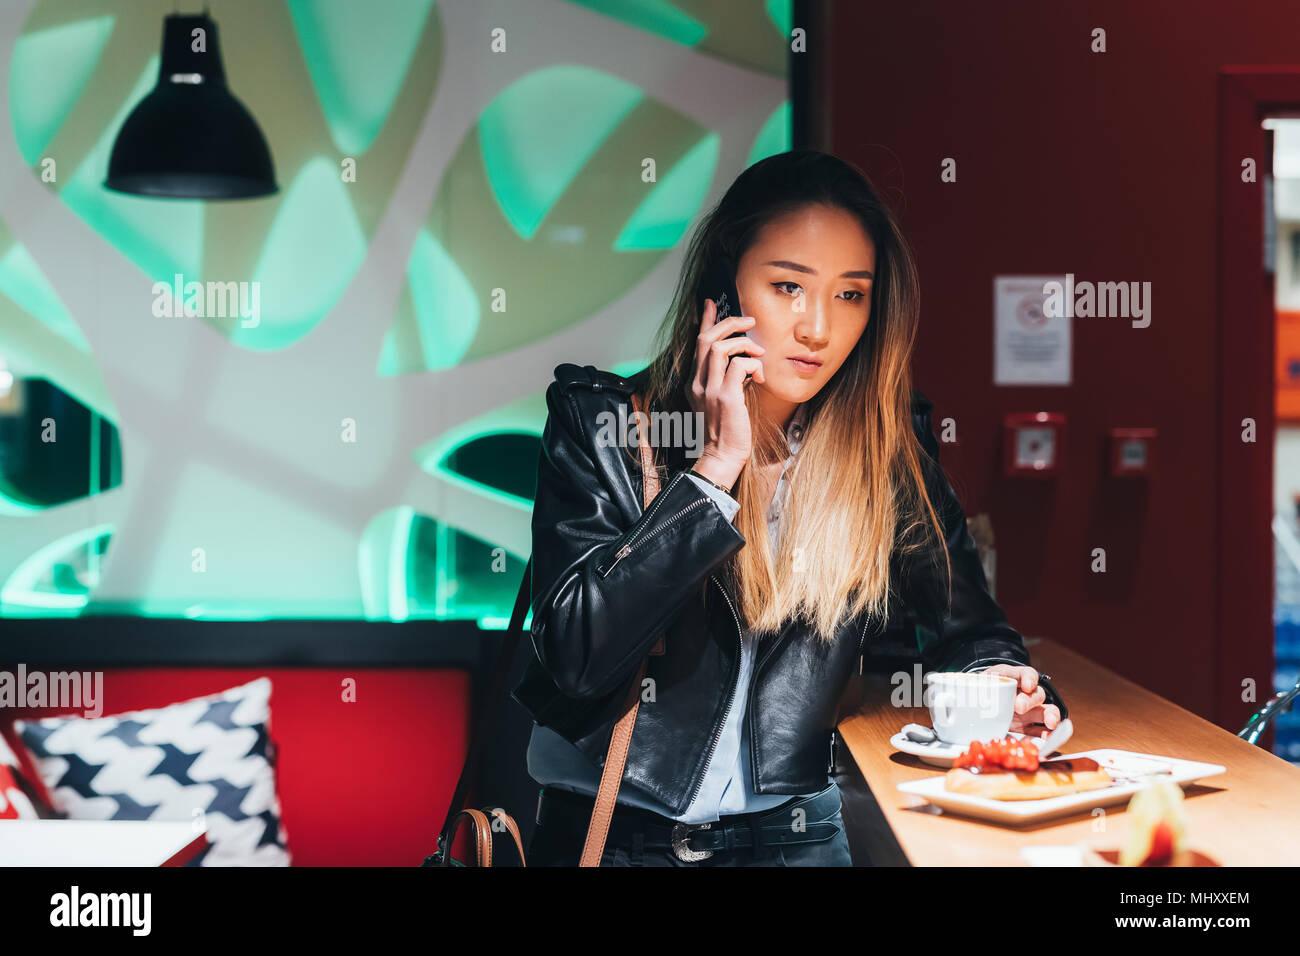 Woman sitting in bar, drinking coffee, using smartphone - Stock Image